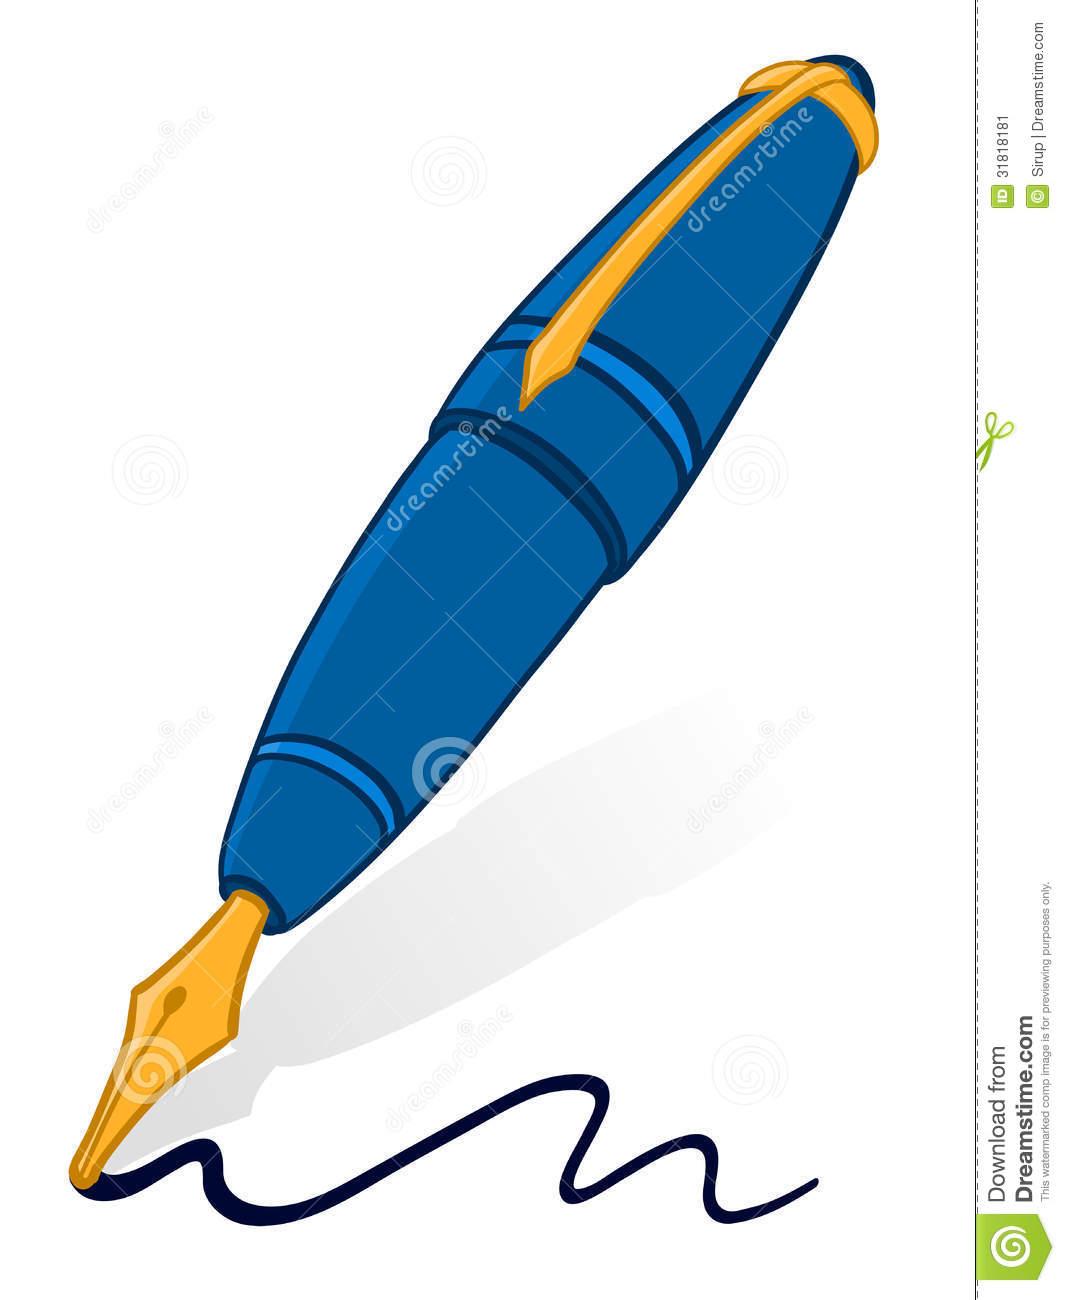 1065x1300 fountain pen clipart doodle illustration classic gold metallic nib